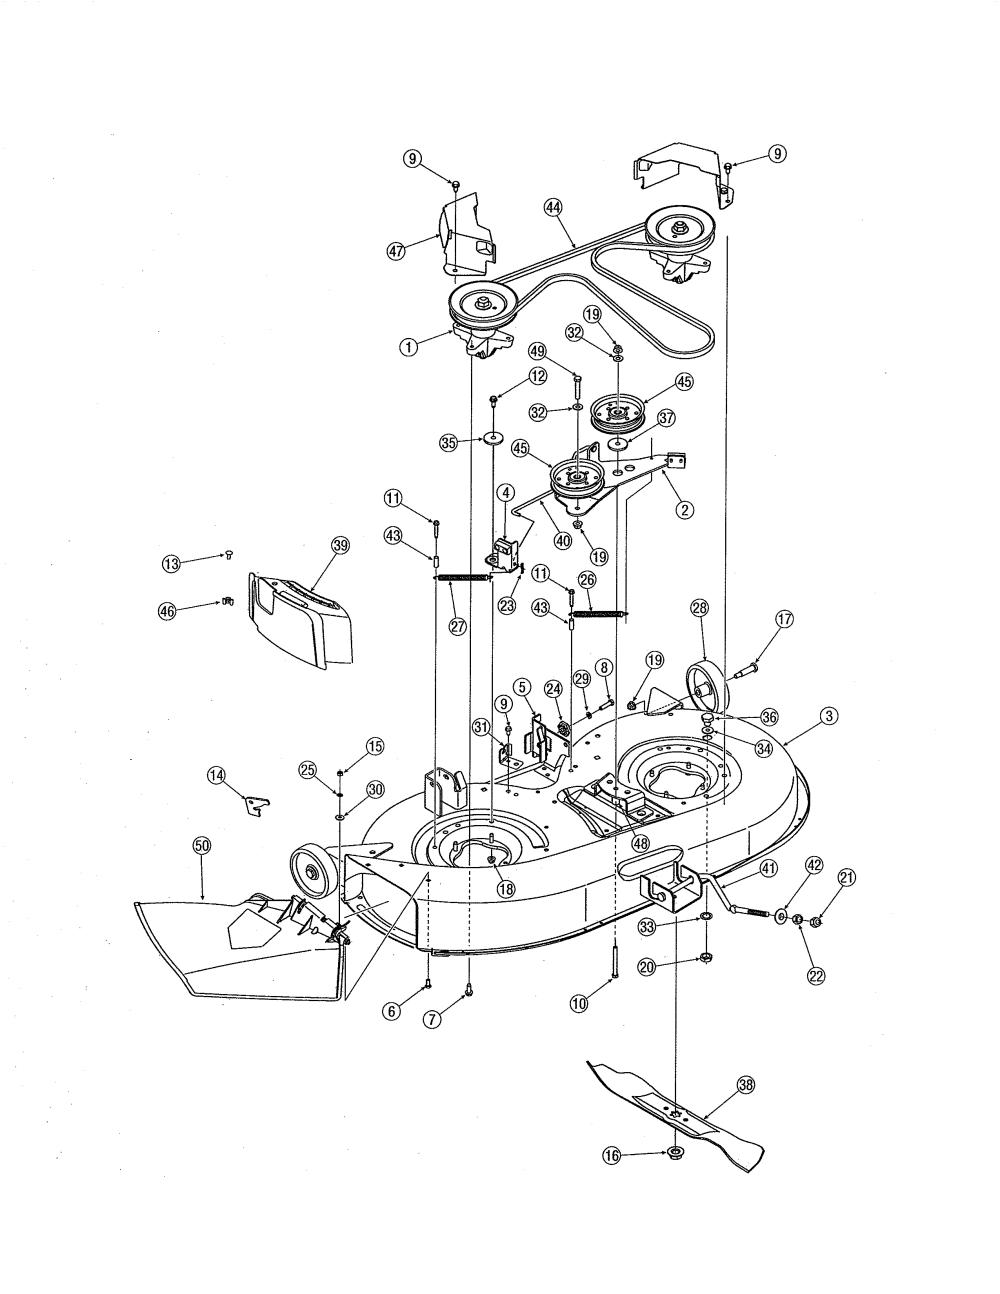 medium resolution of differential mtd 13bn771g729 42 deck diagram